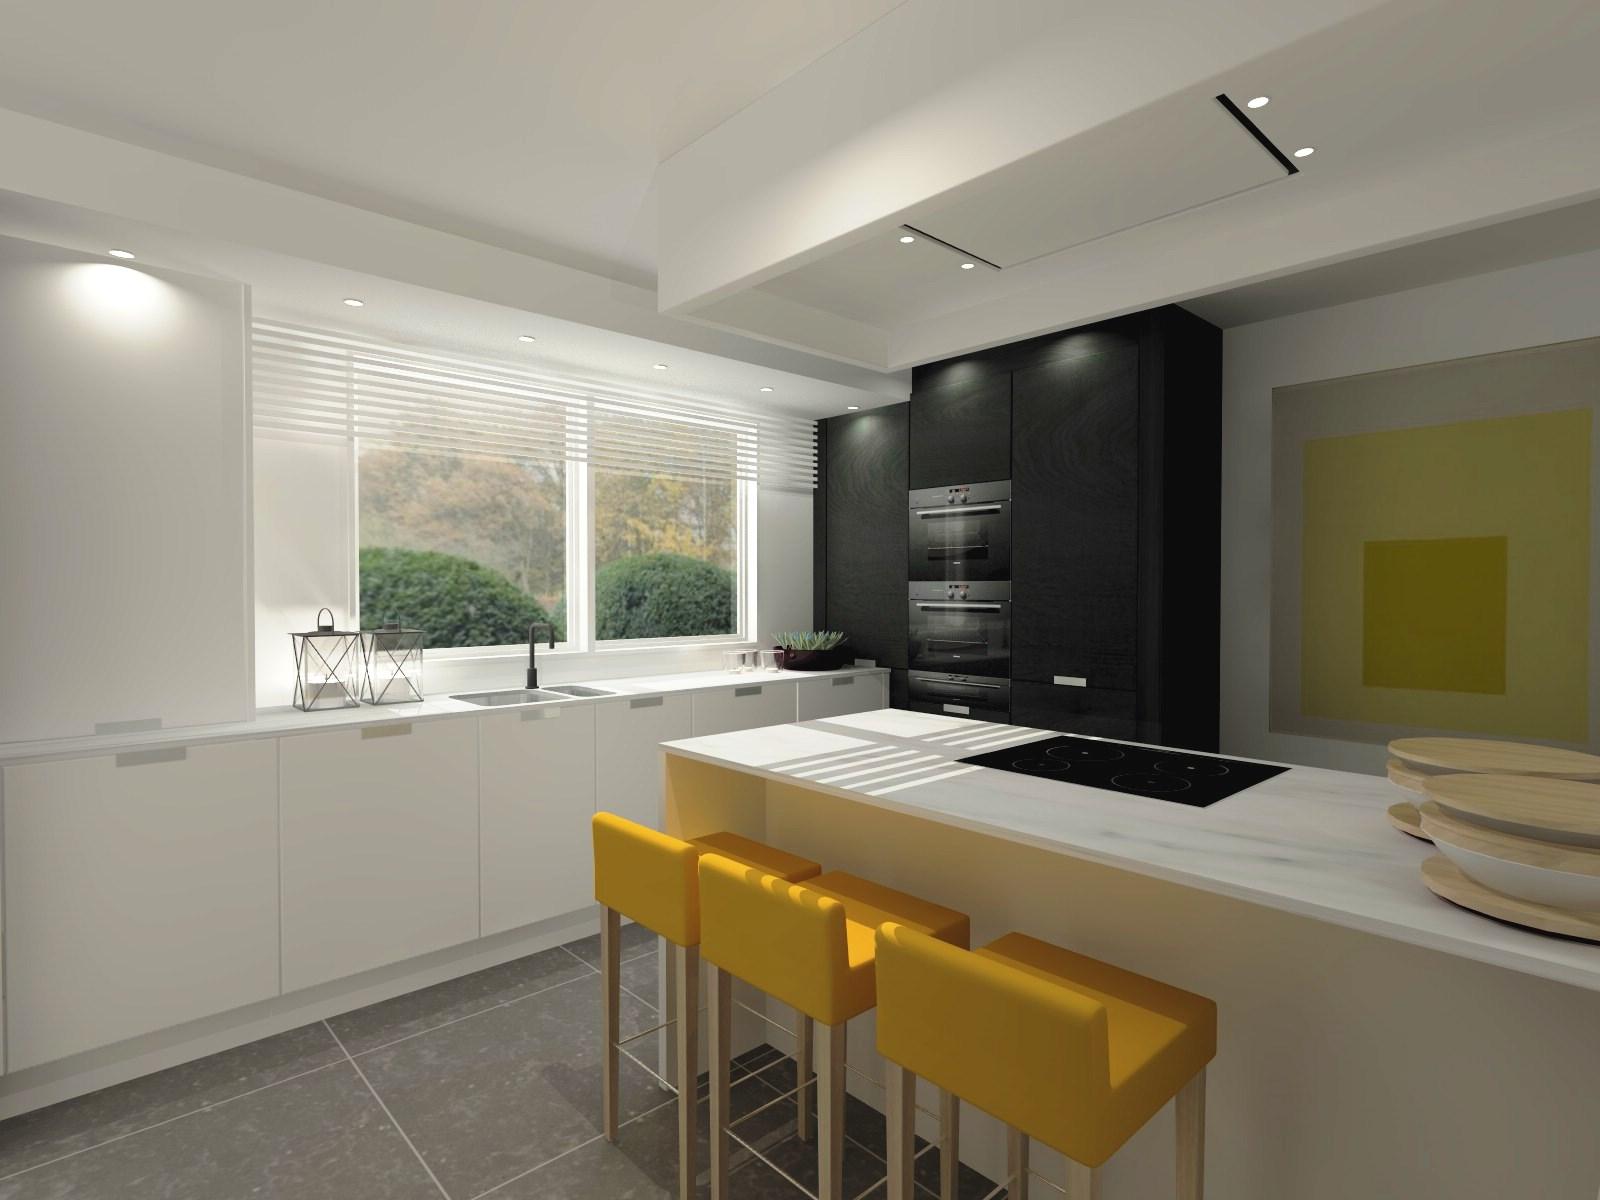 Keuken K9